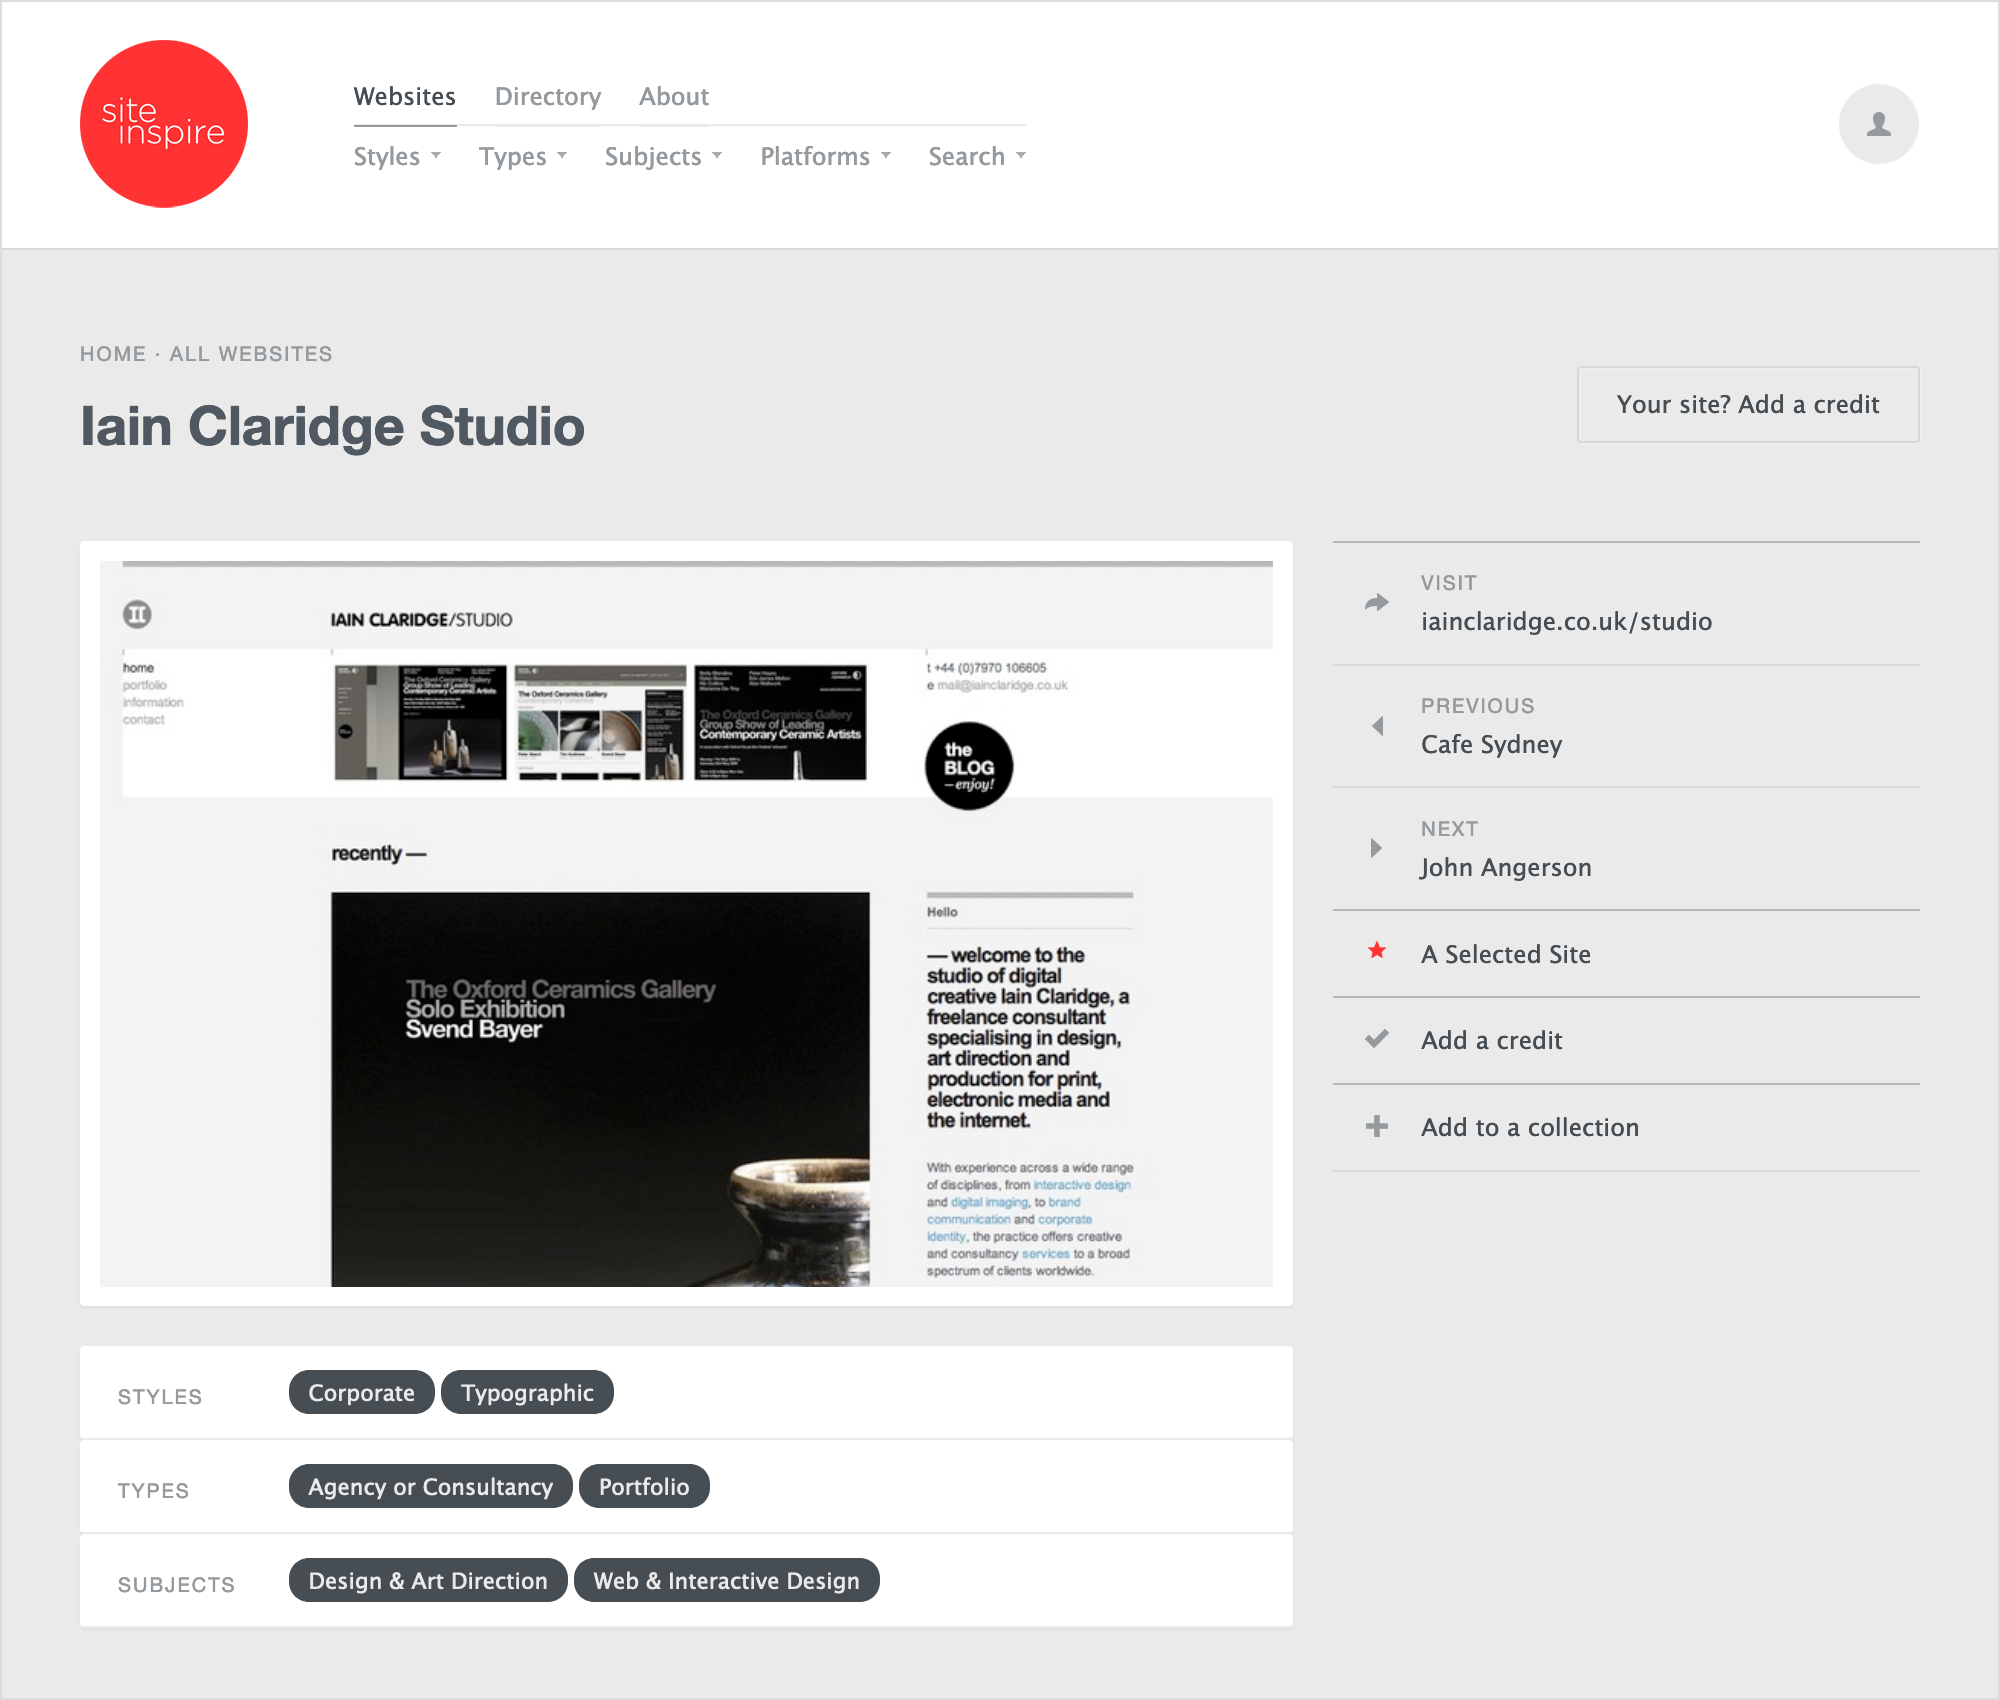 Iain Claridge Studio on Site Inspire